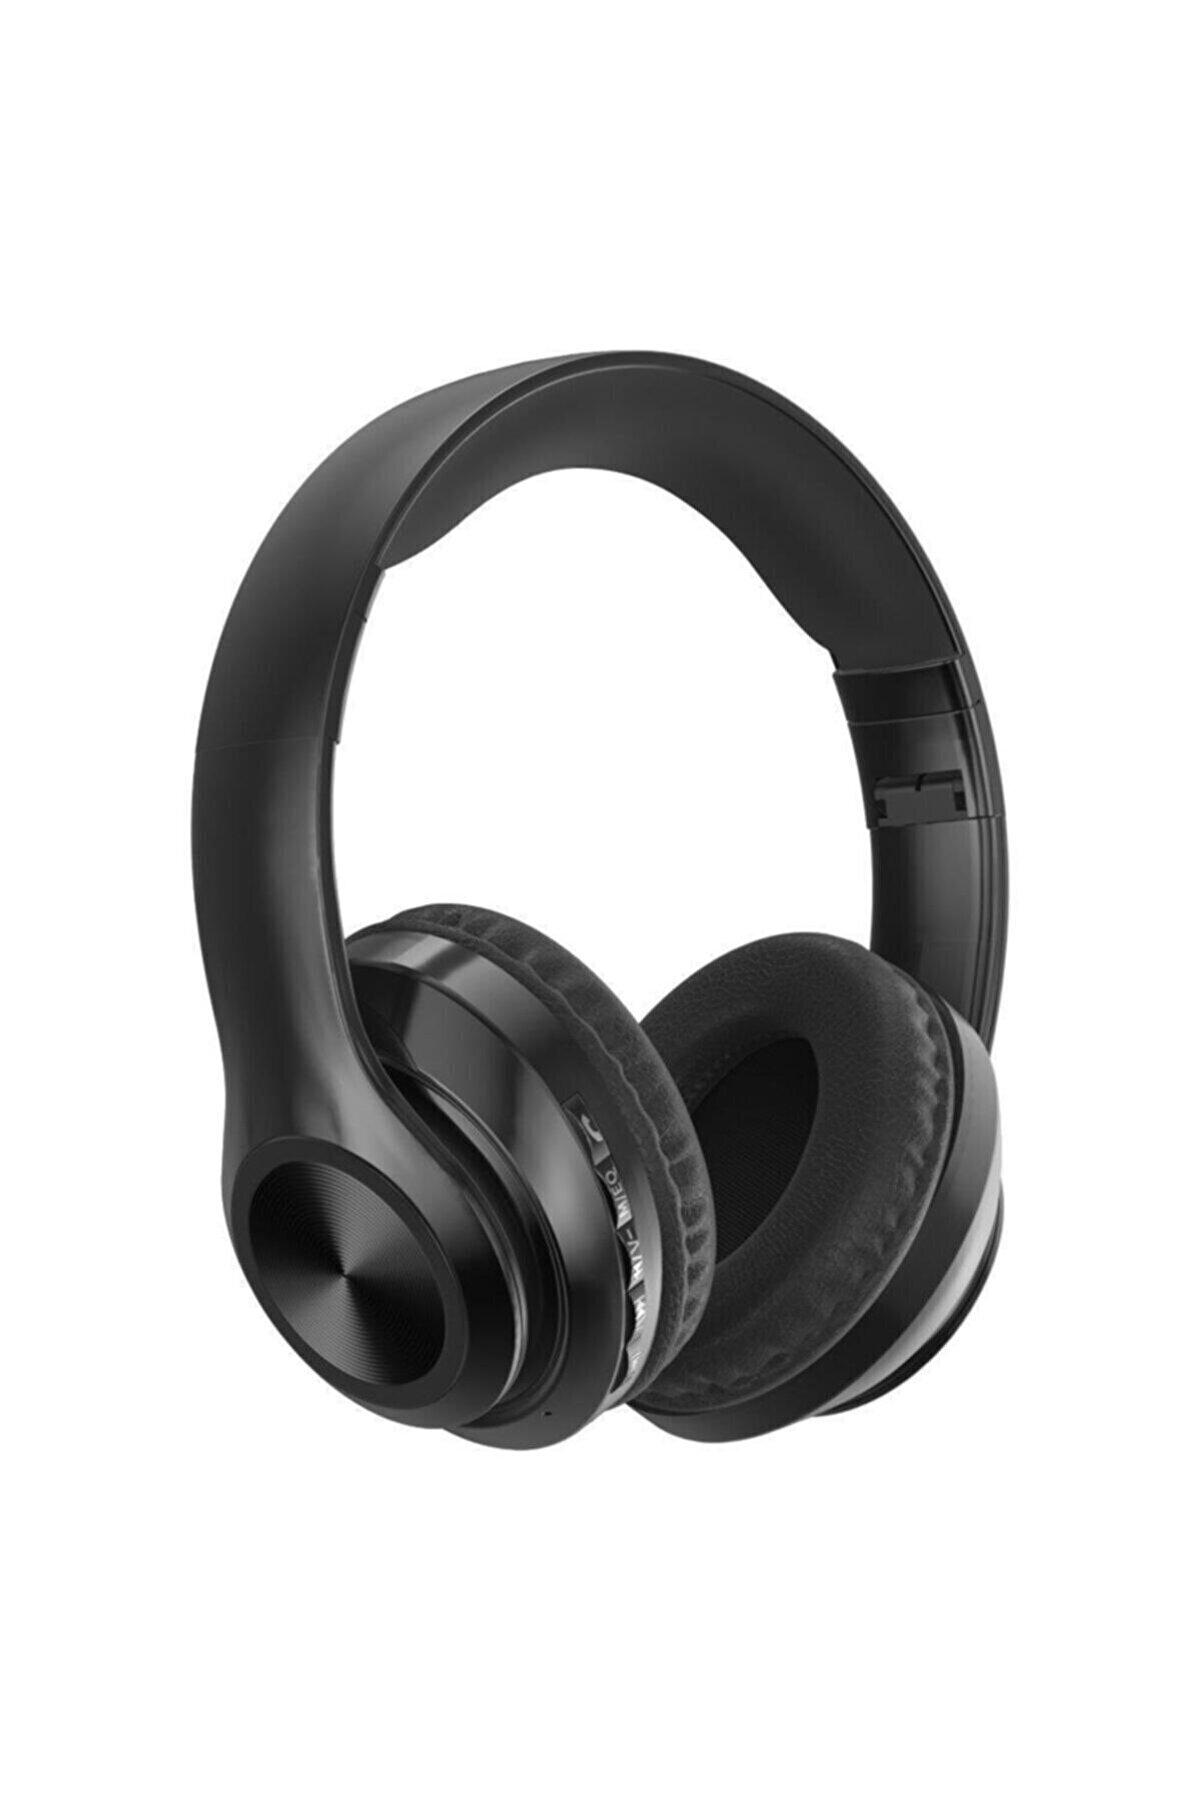 Polygold P68 Bluetooth Kulaklık Kablosuz Stereo Kulaklık Macaron Kulaklık Renkli-siyah